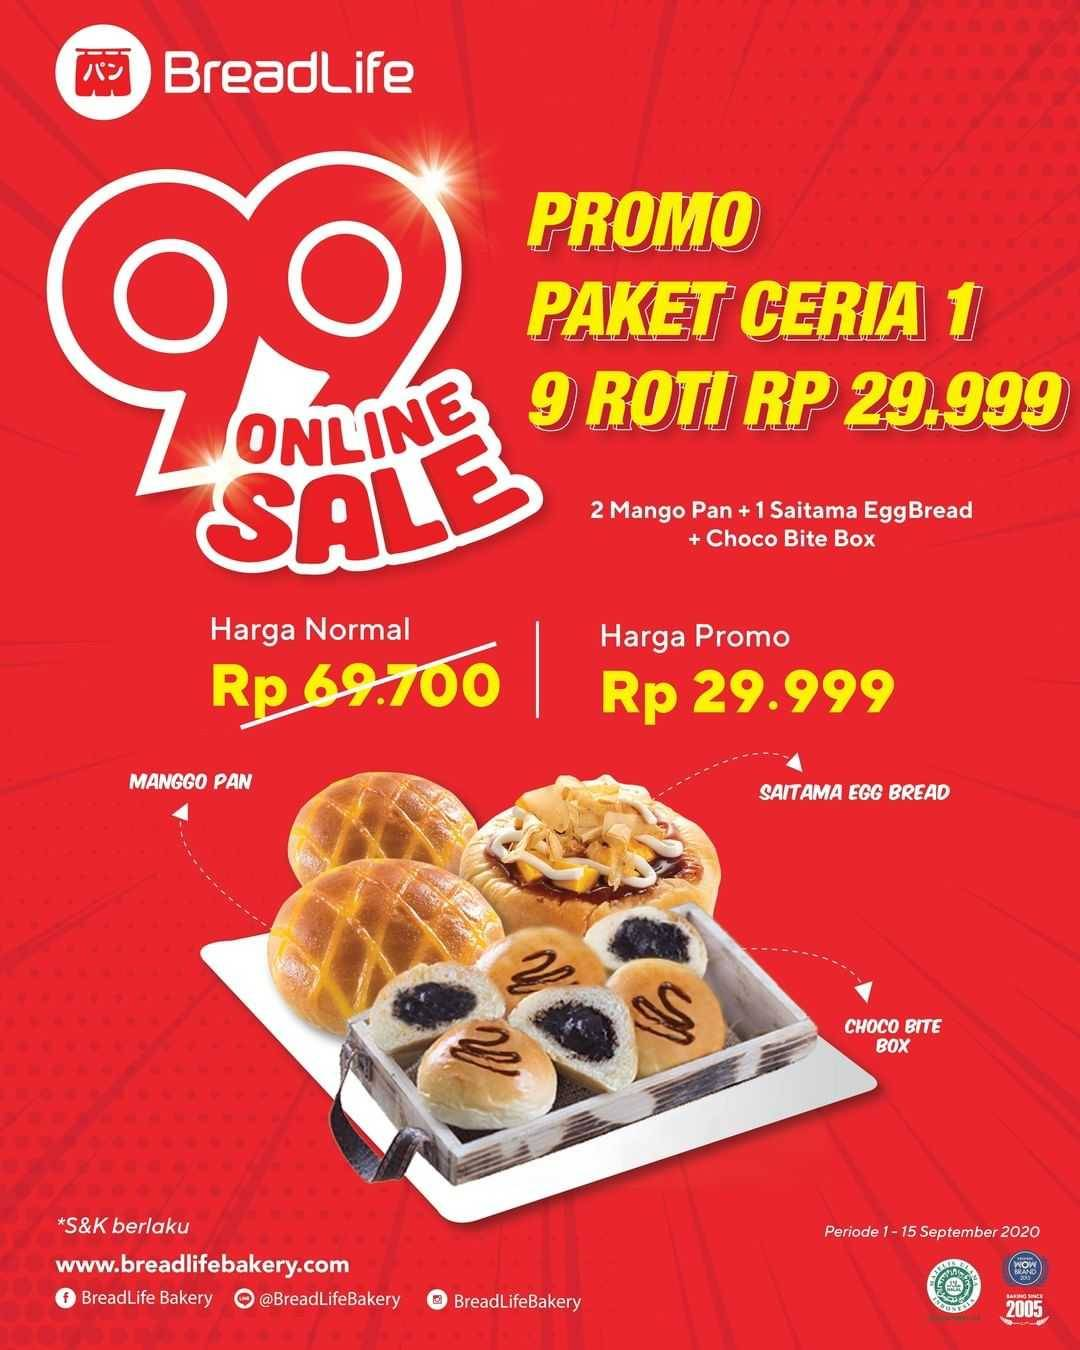 Promo diskon Breadlife 99 Online Sale - Promo Paket Ceria